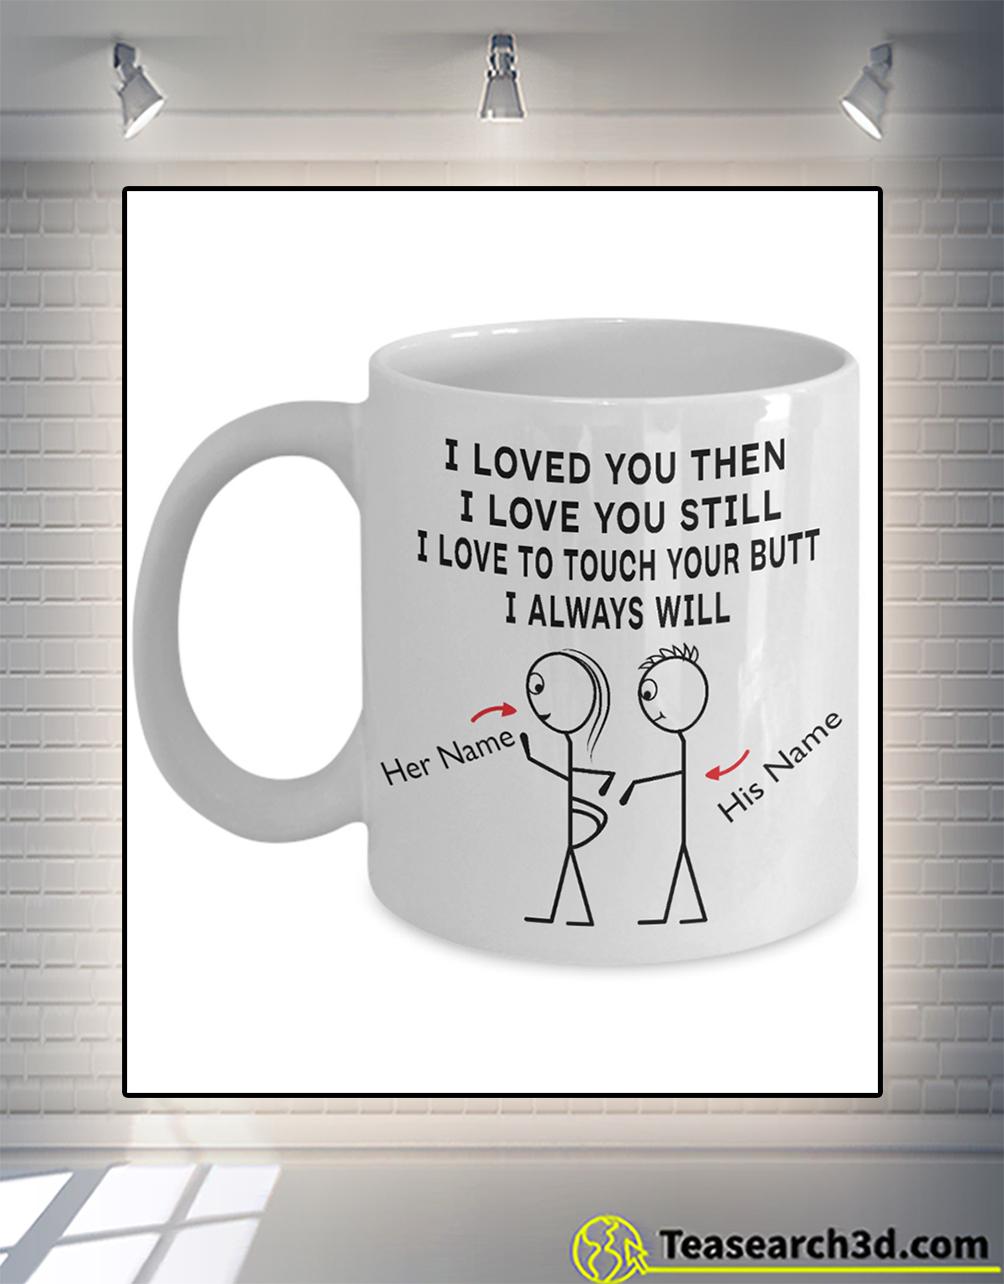 I love you then I love you still personalized custom name mug